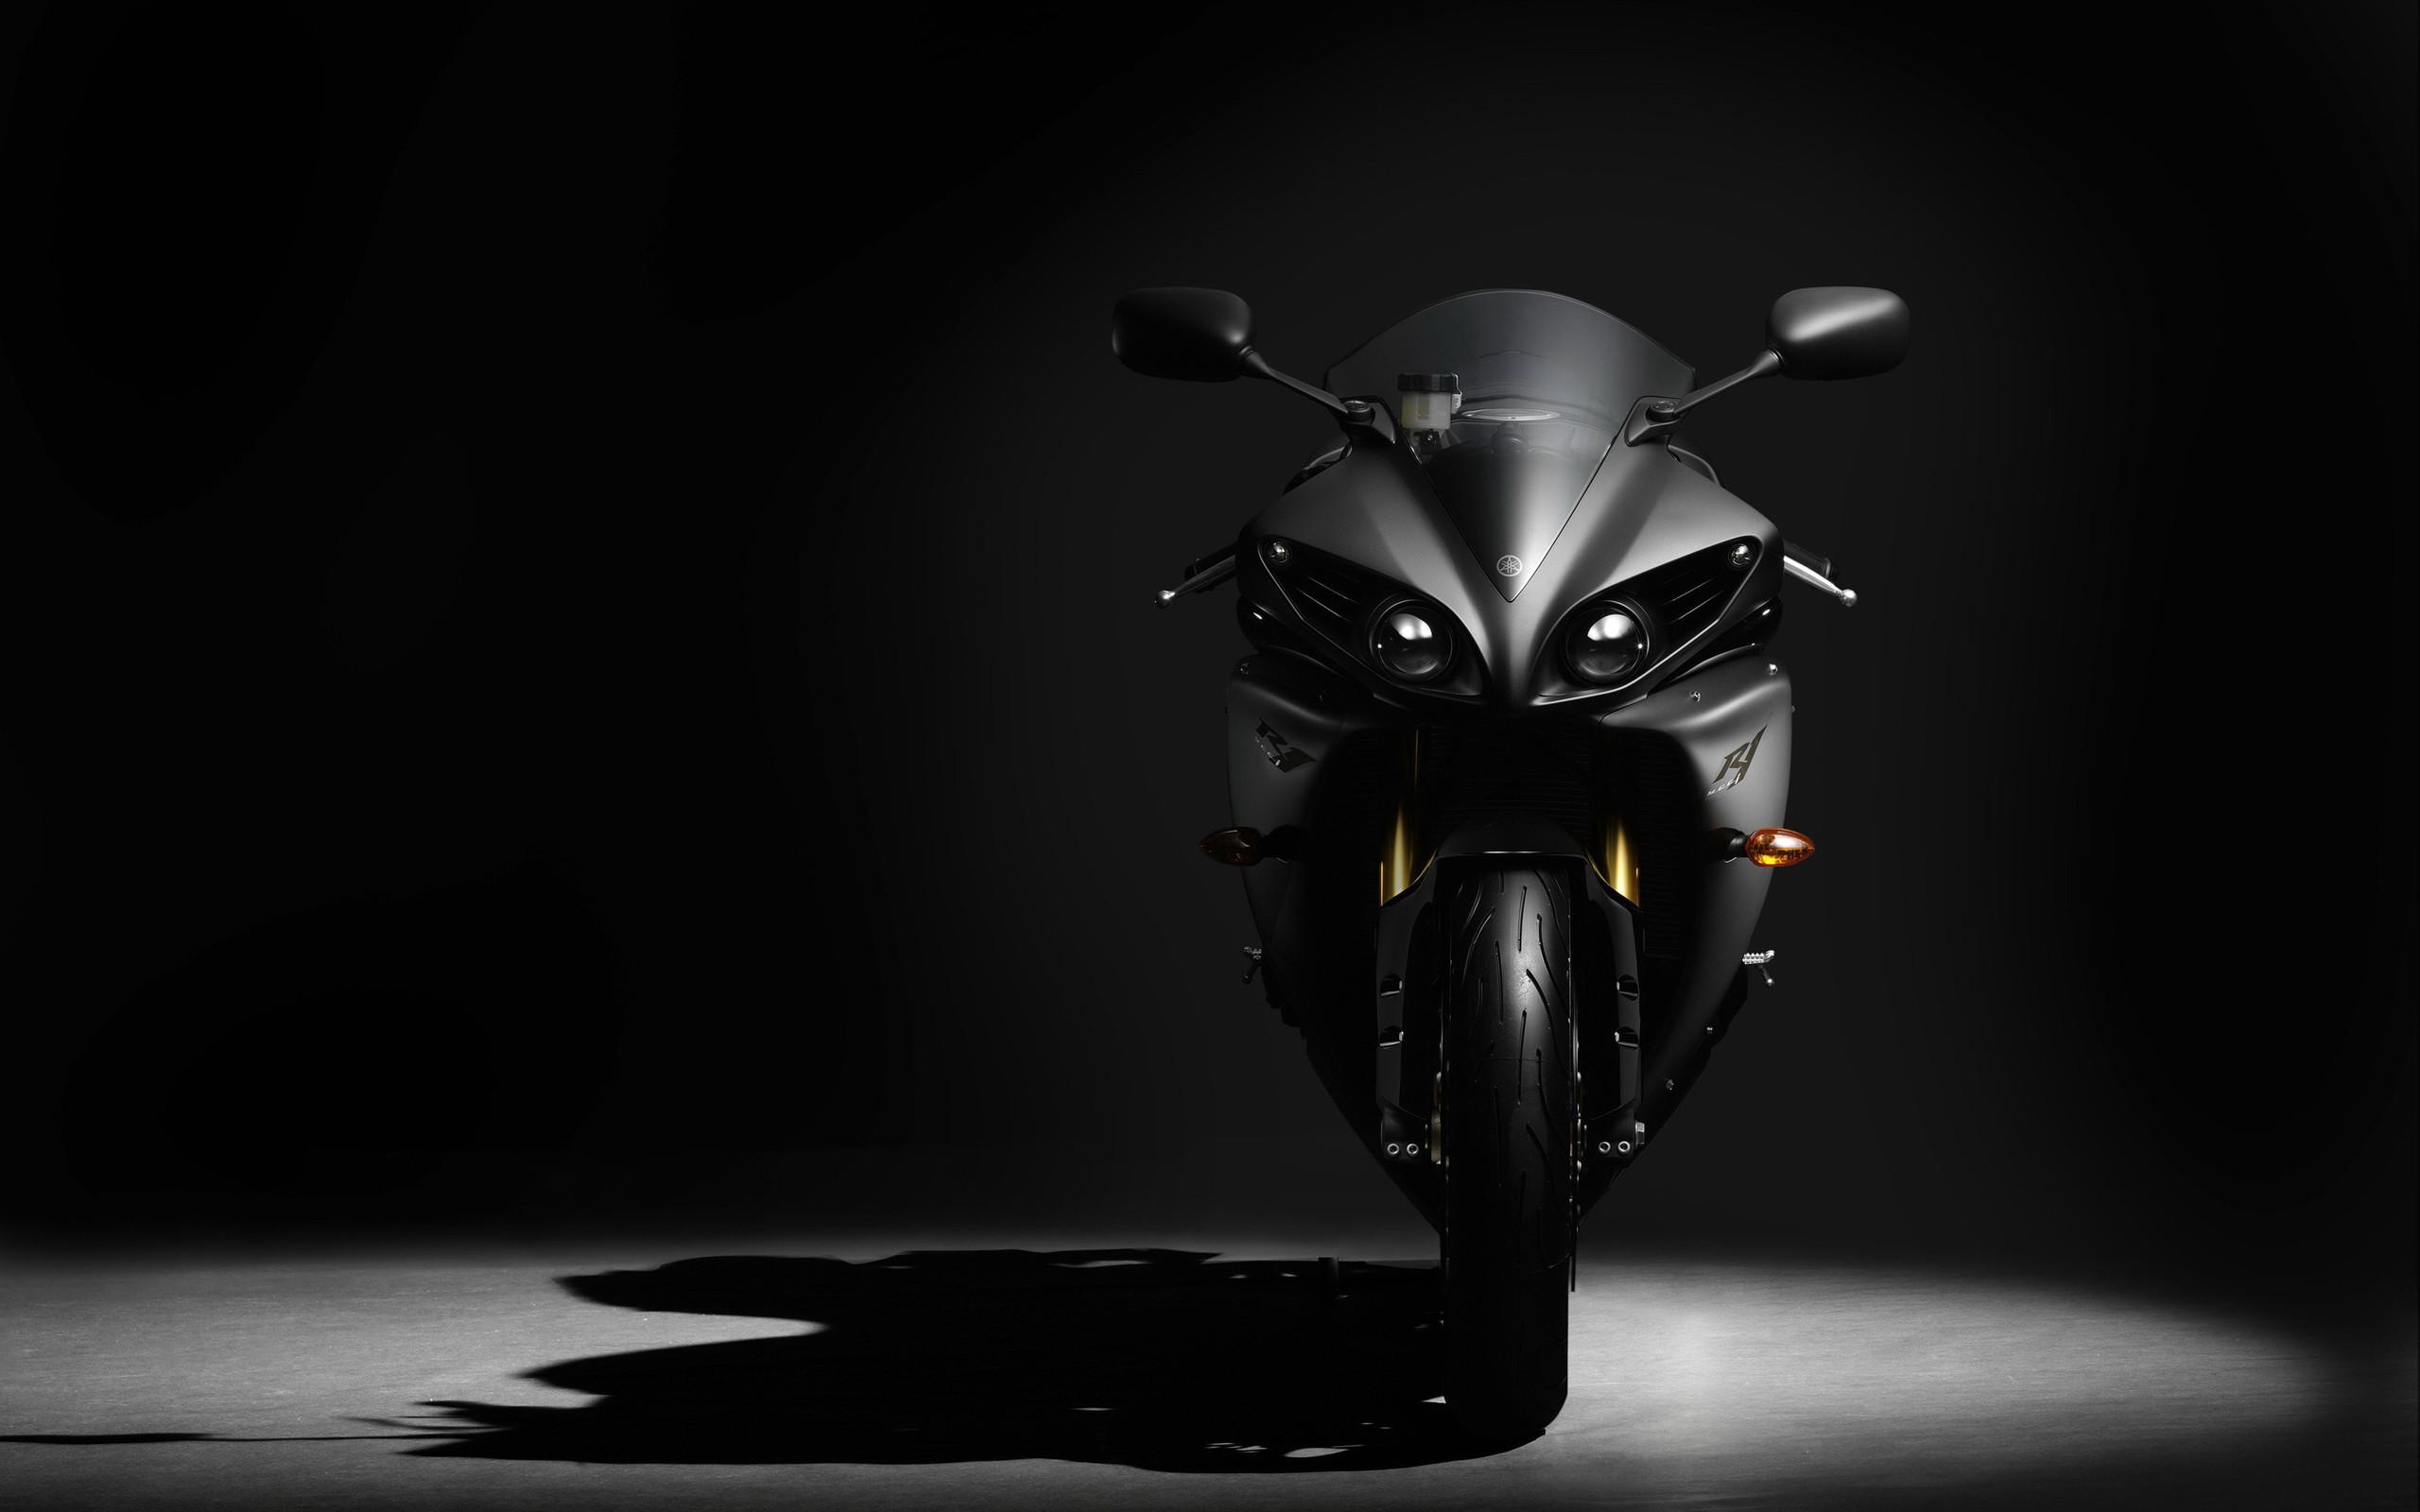 Yamaha YZF R Bike Wallpaper